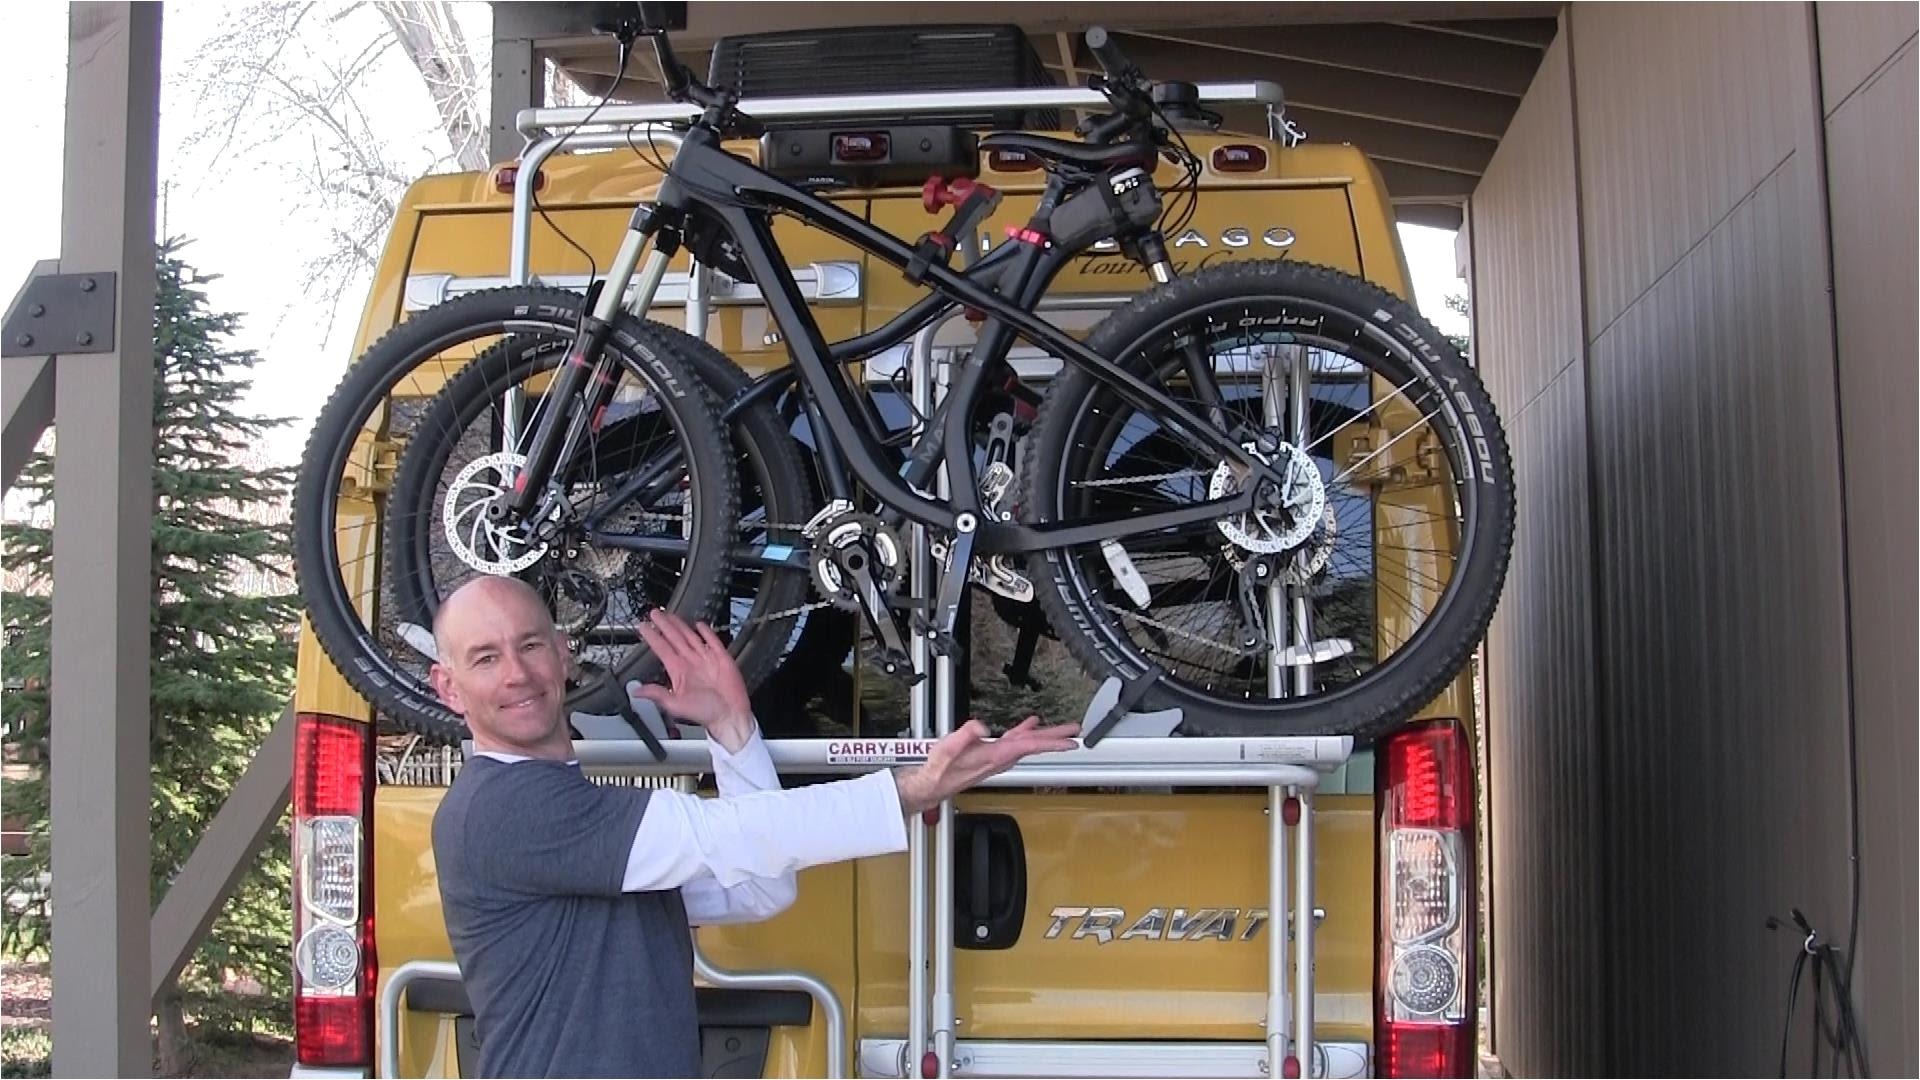 using the fiamma rv bike rack